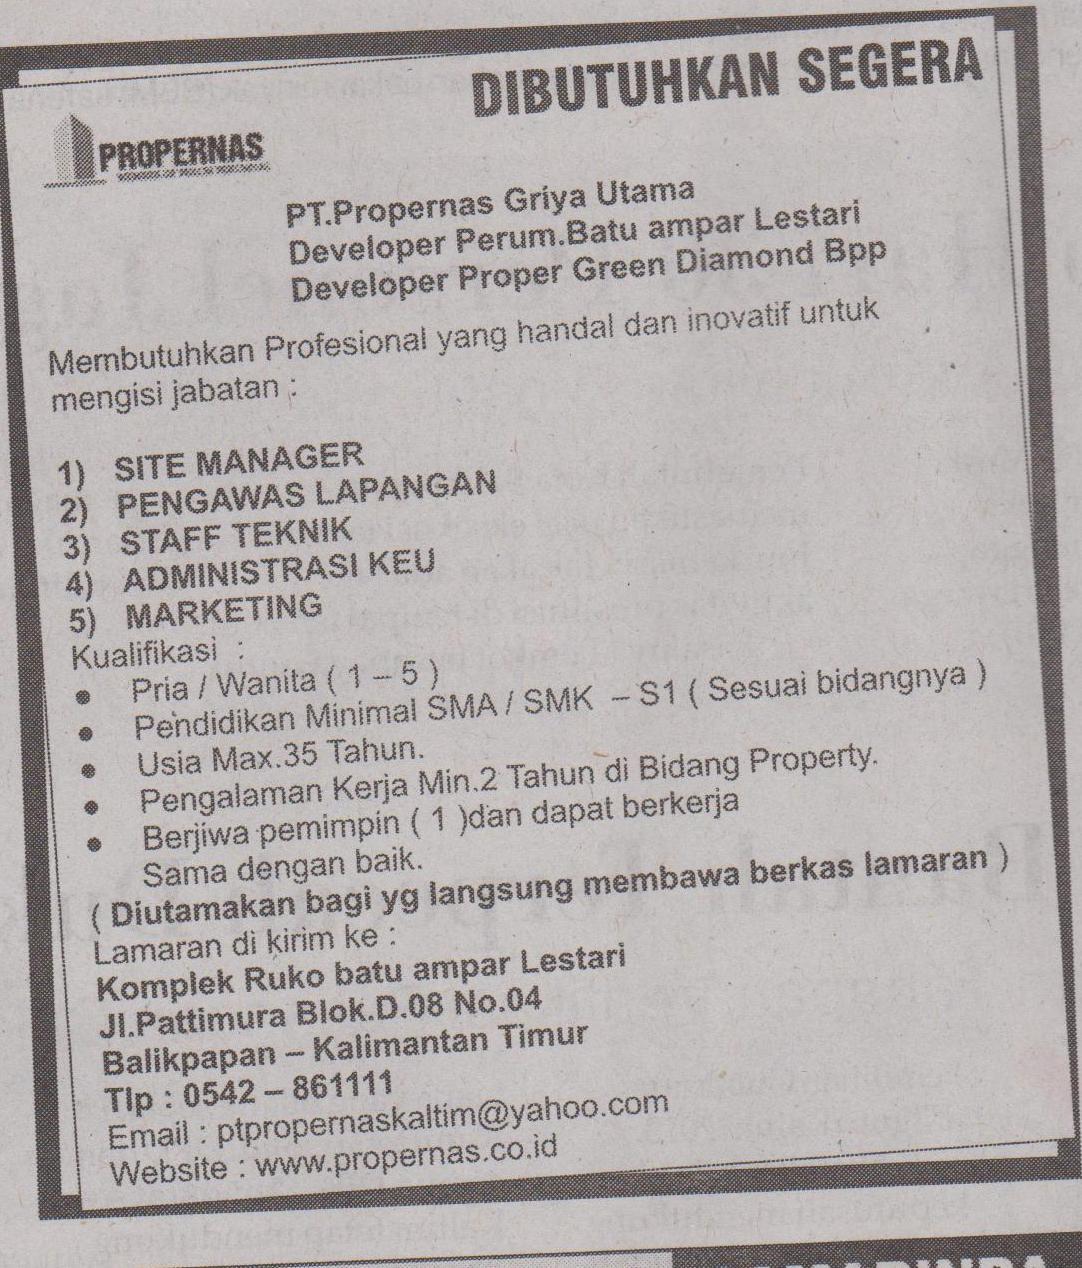 Lowongan Kerja Surabaya April 2013 Terbaru Lowongan Kerja Loker Terbaru Bulan September 2016 Lowongan Kerja 9 Juni 2014 Boss Tambang